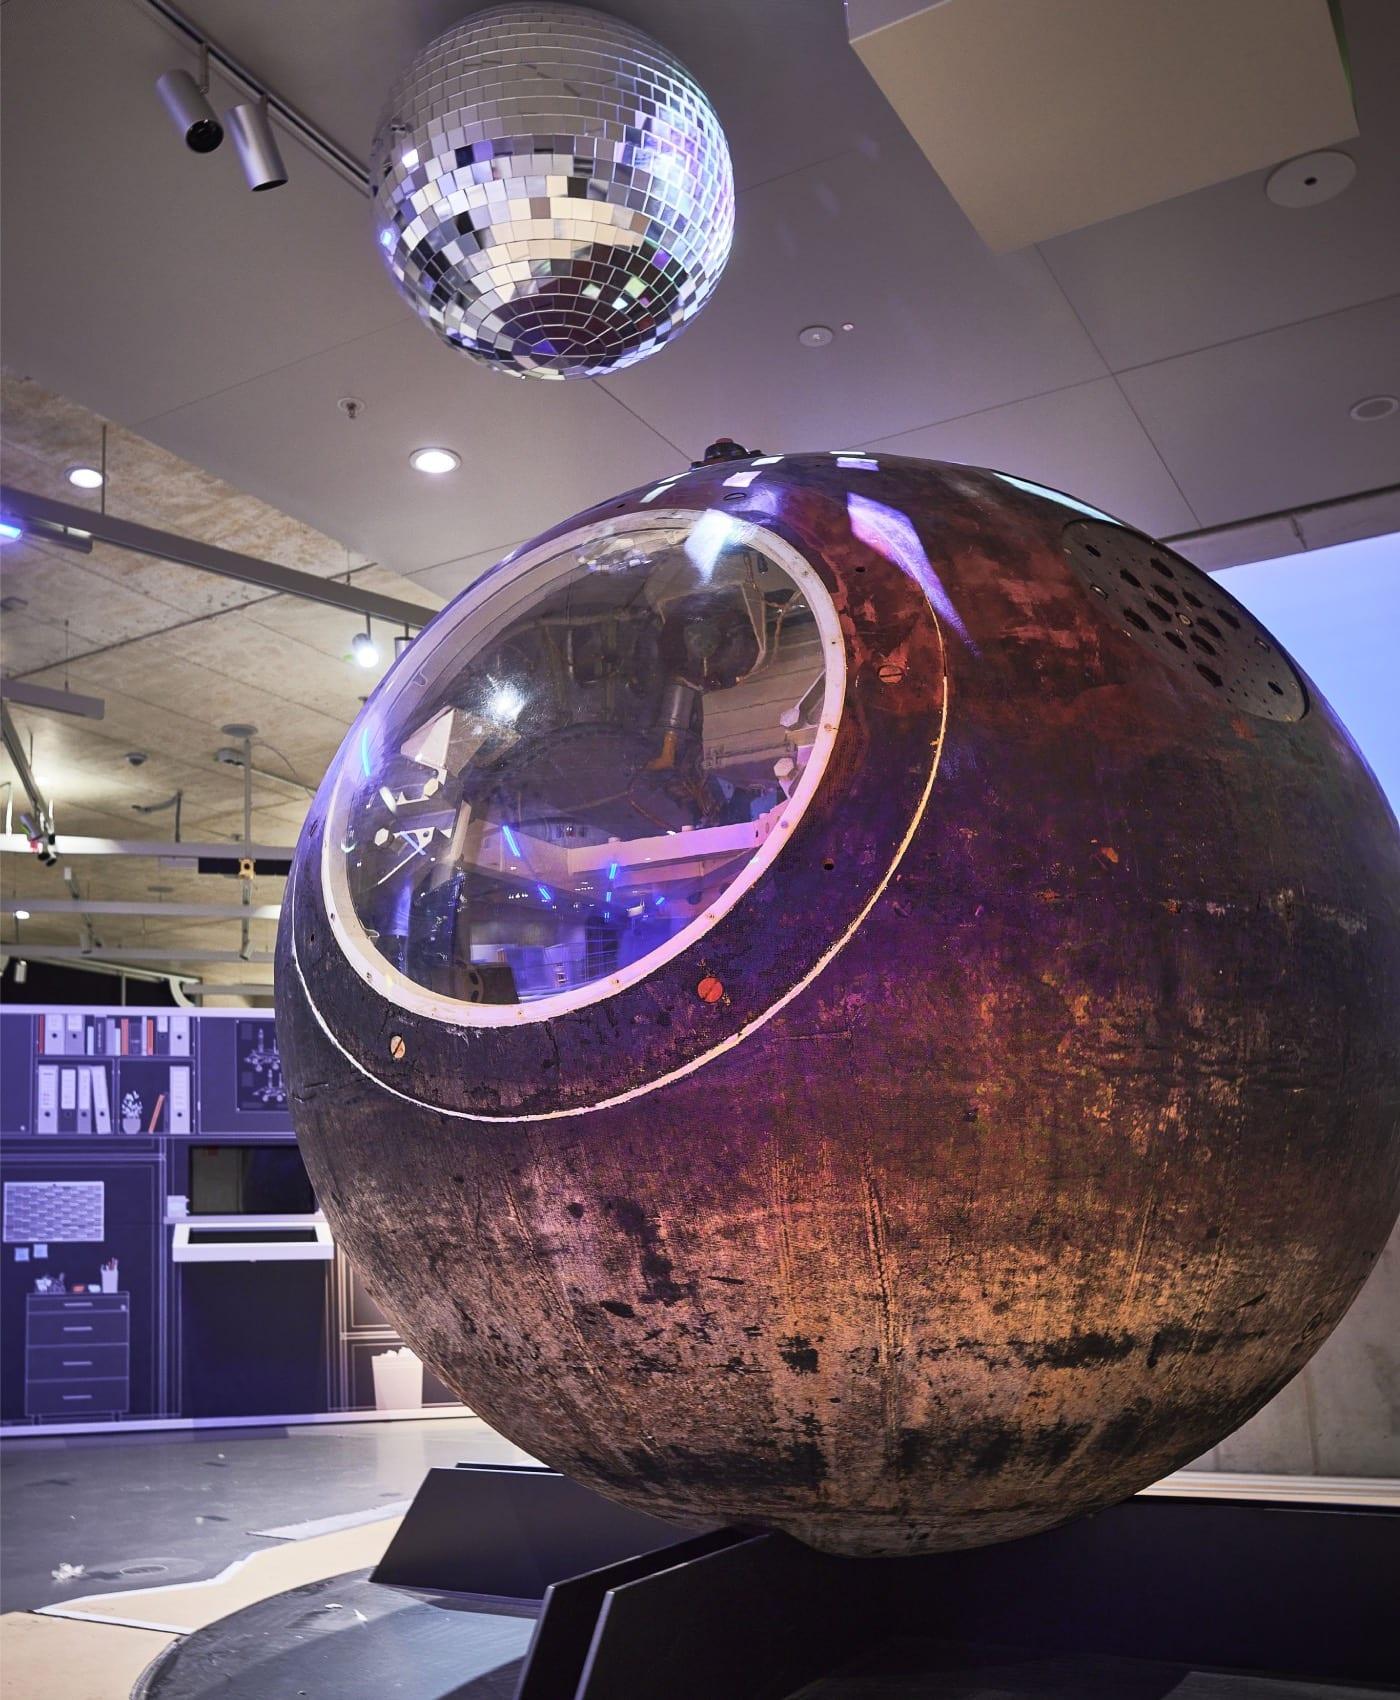 Raumkapsel im Zukunftsmuseum in Nürnberg // HIMBEER